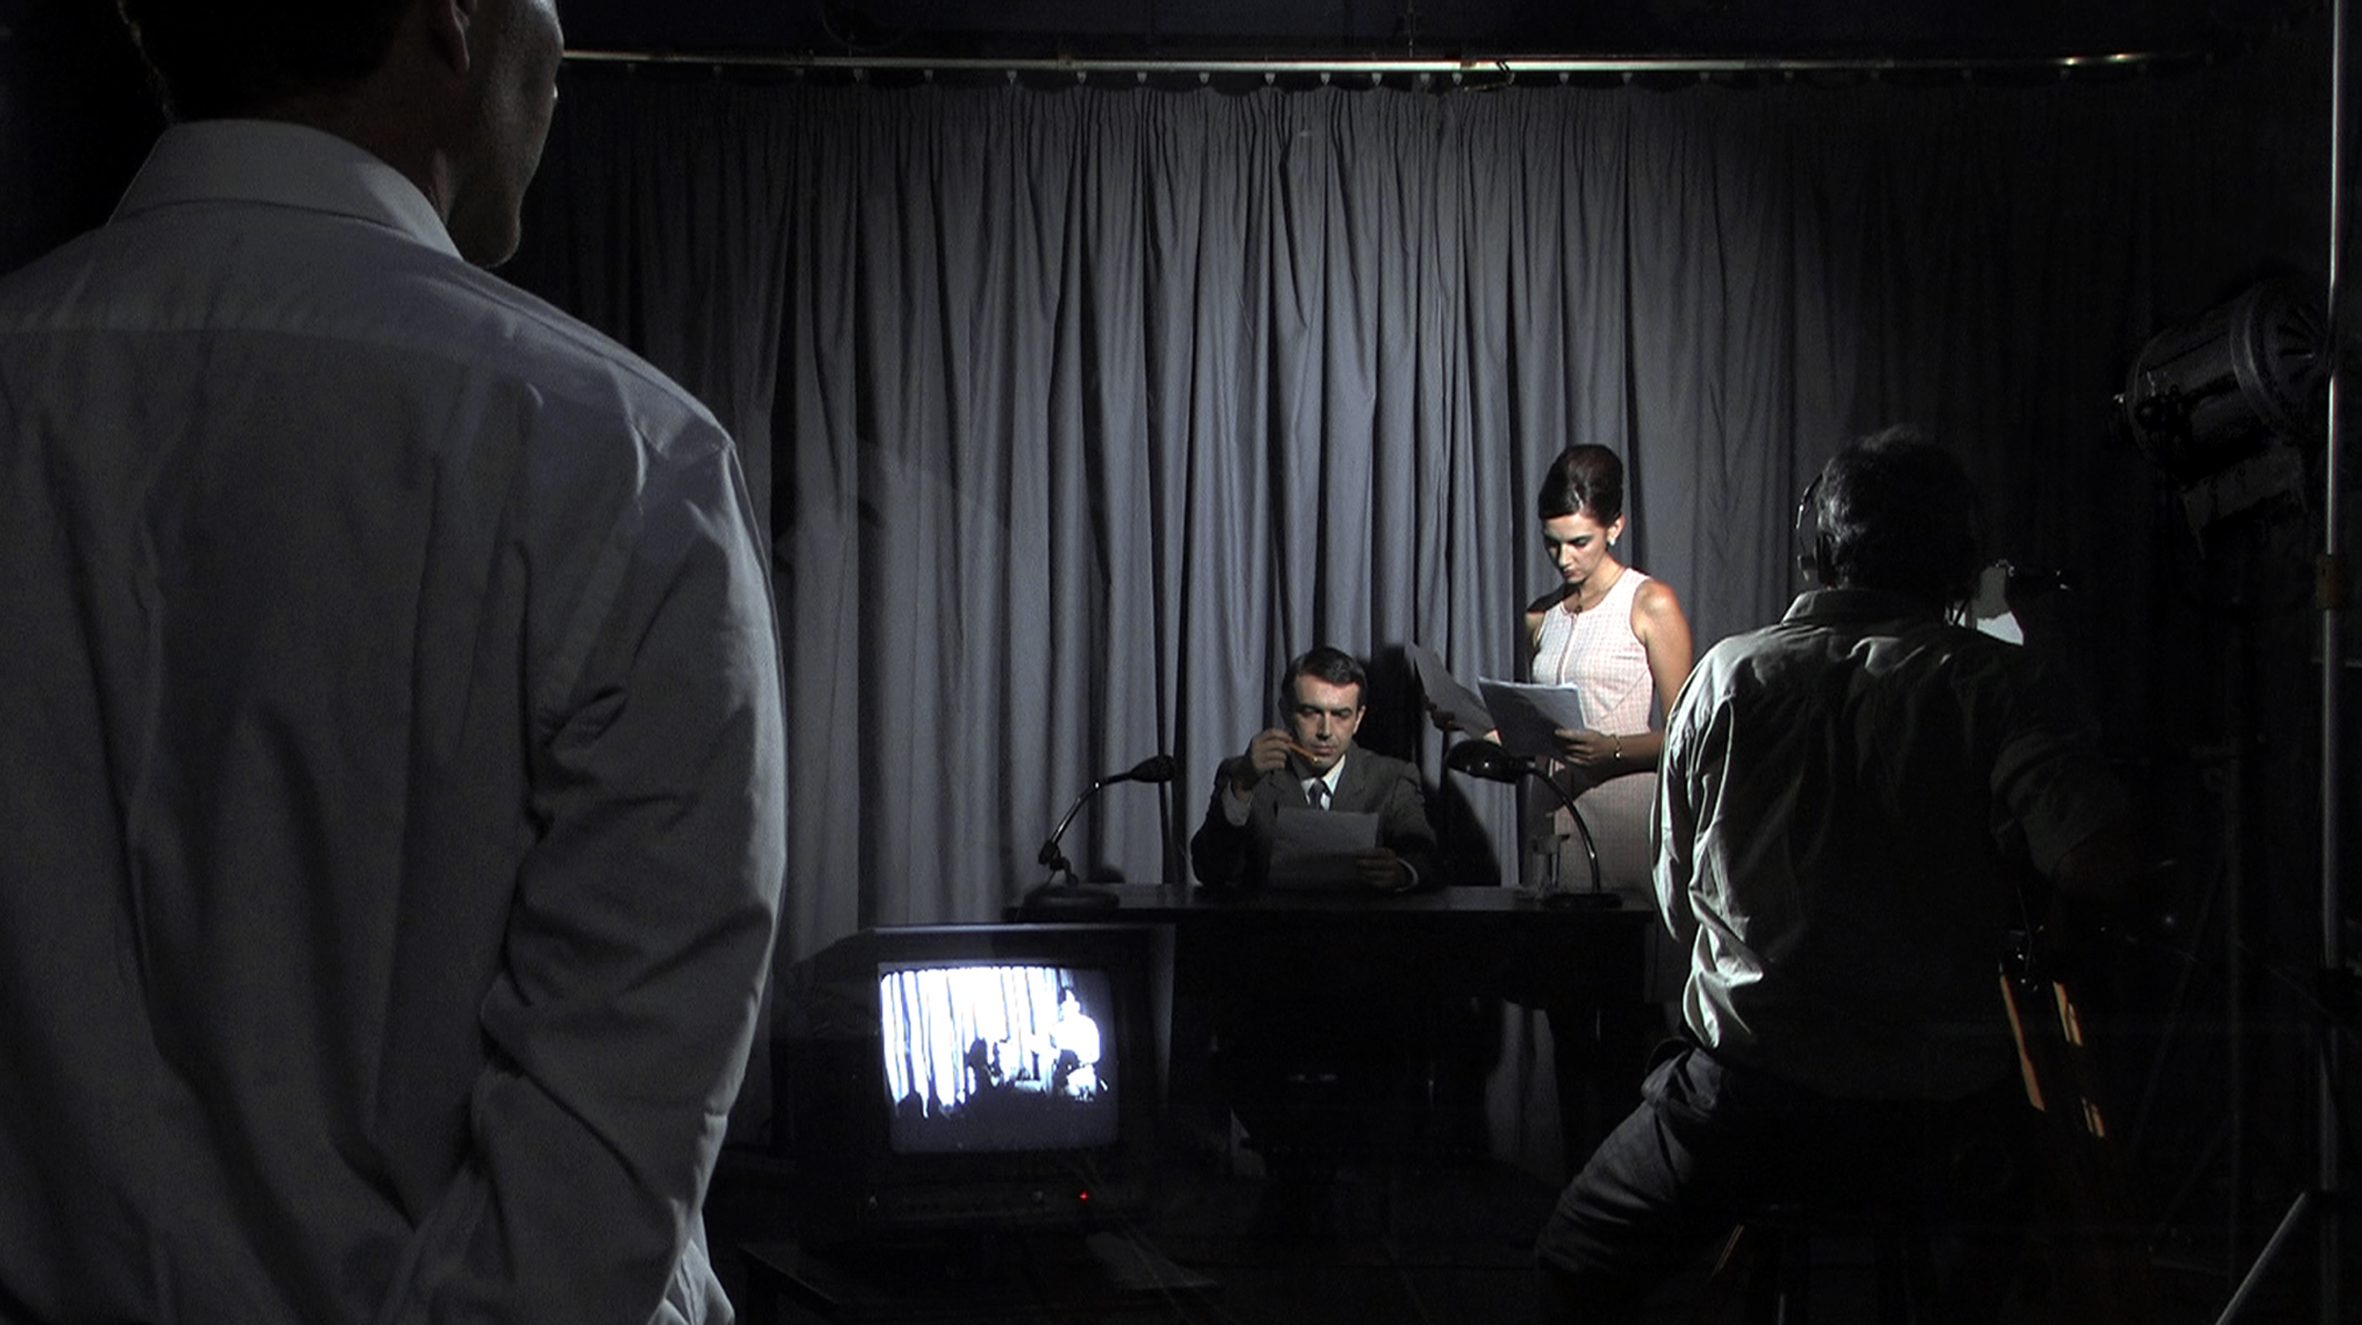 Untitled (The Remake) 2007_video still_HDV transferred on Bluray_03.jpg